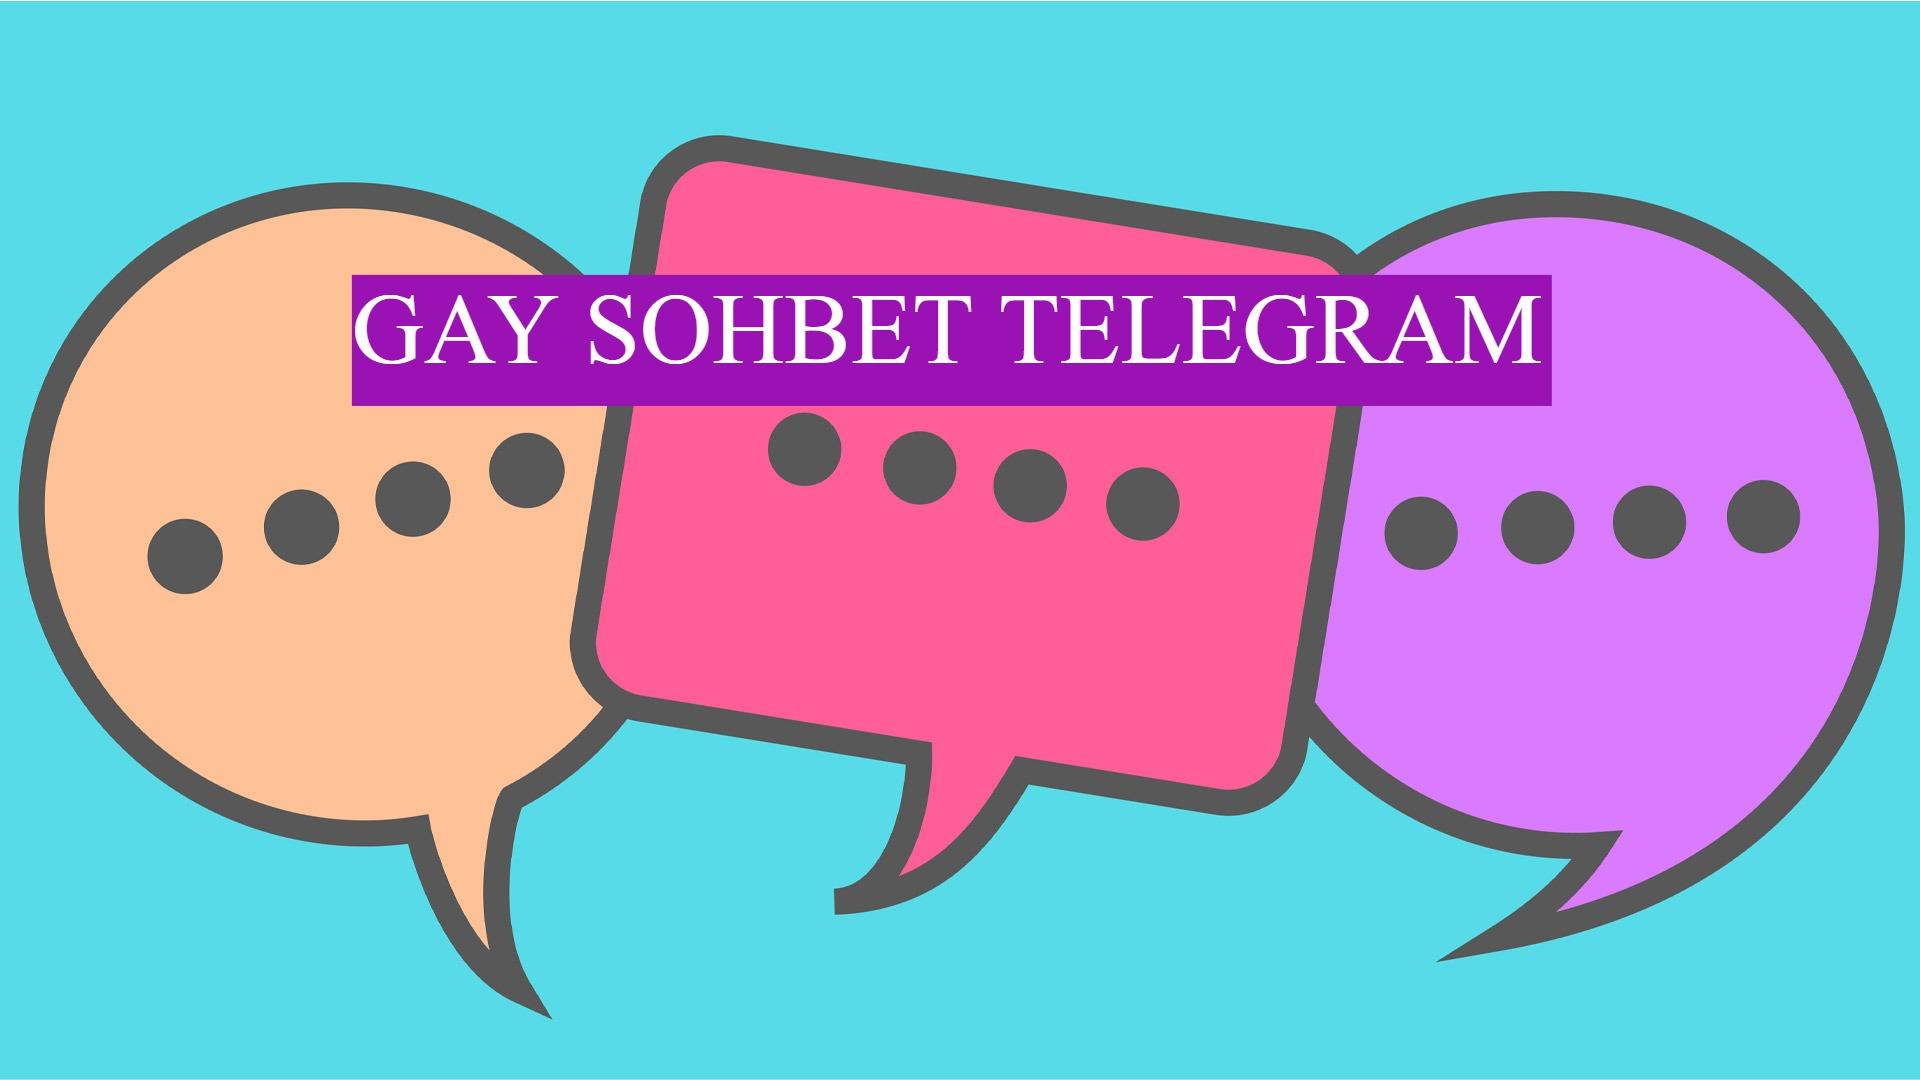 Gay Sohbet Telegram